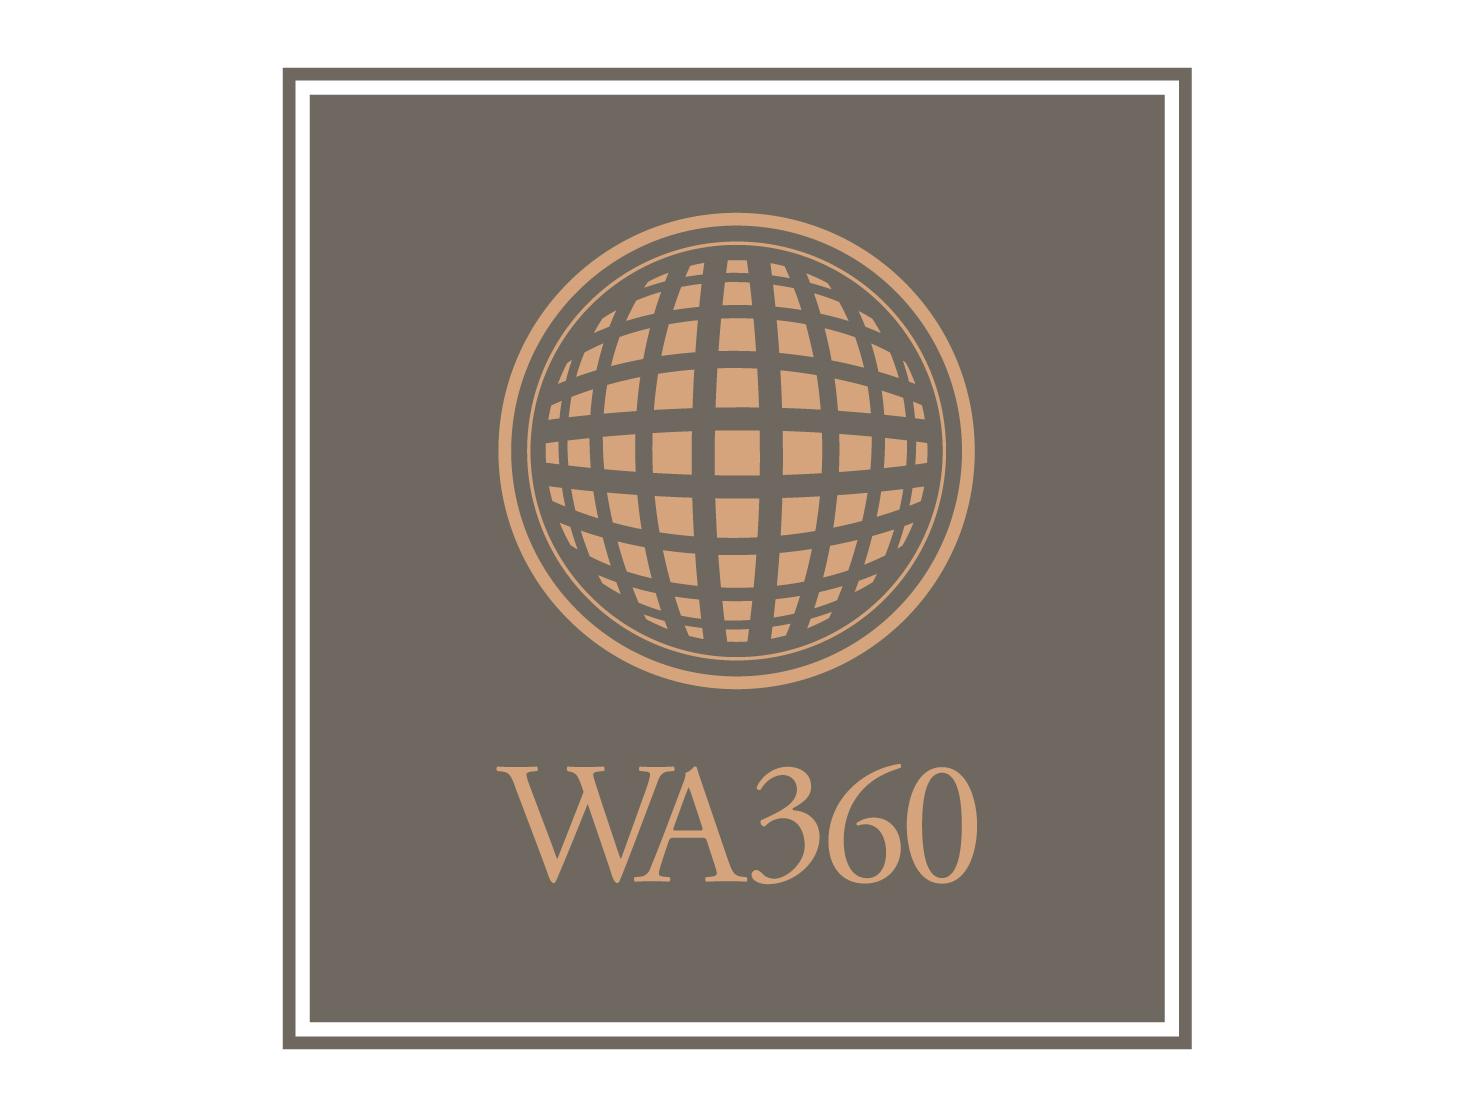 wa360 logo